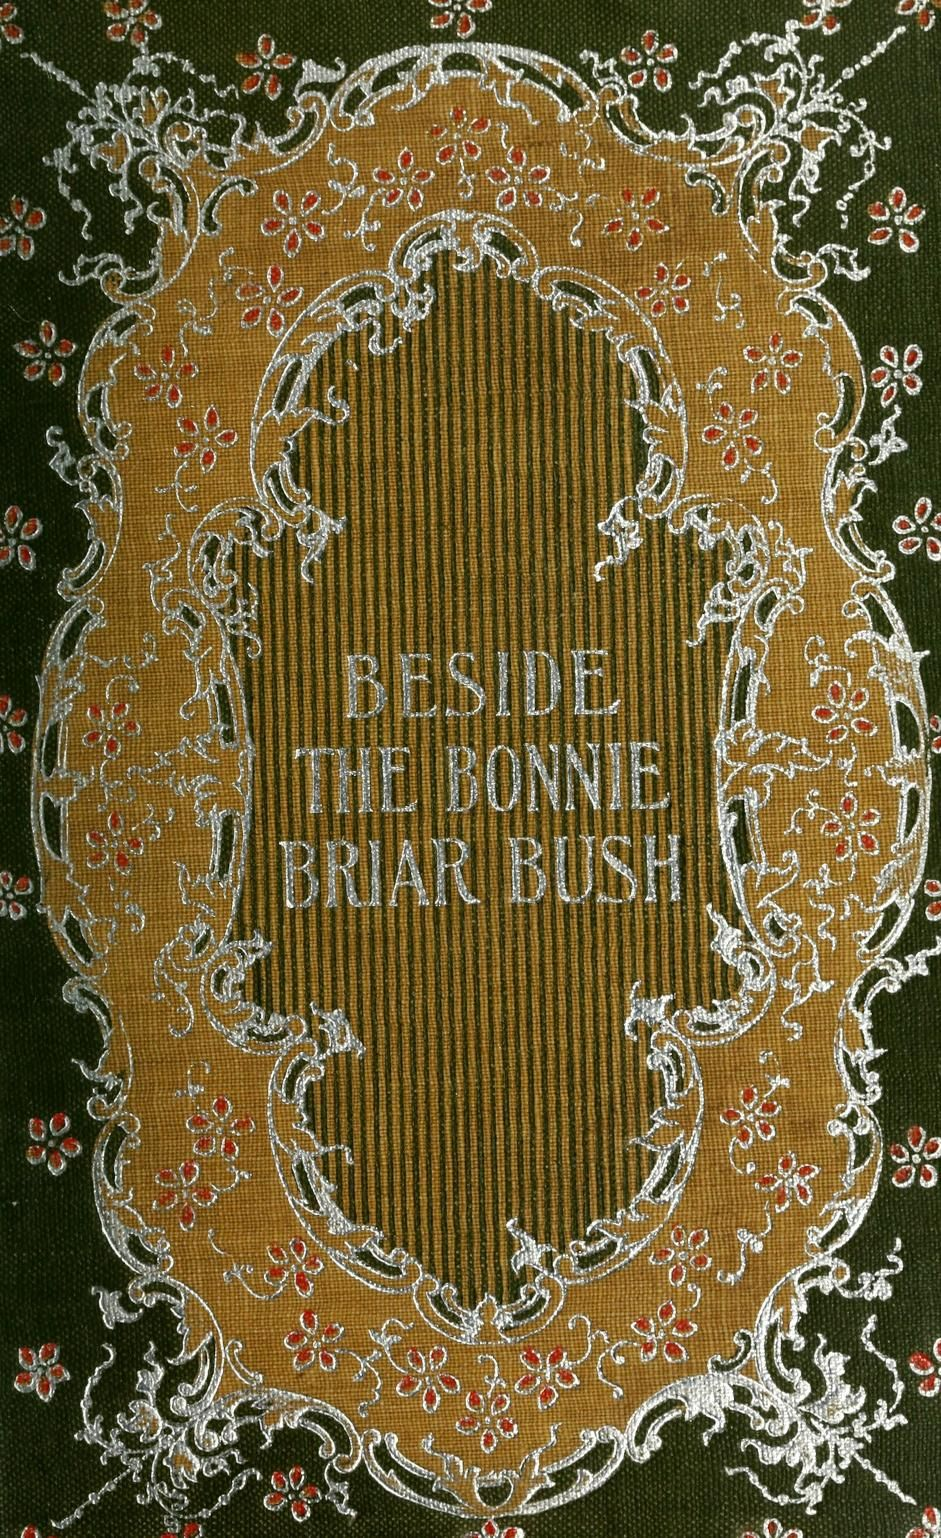 'Beside the bonnie brier bush' by Rev. John Watson (Ian Maclaren). H. M. Caldwell Co.; New York, 1890